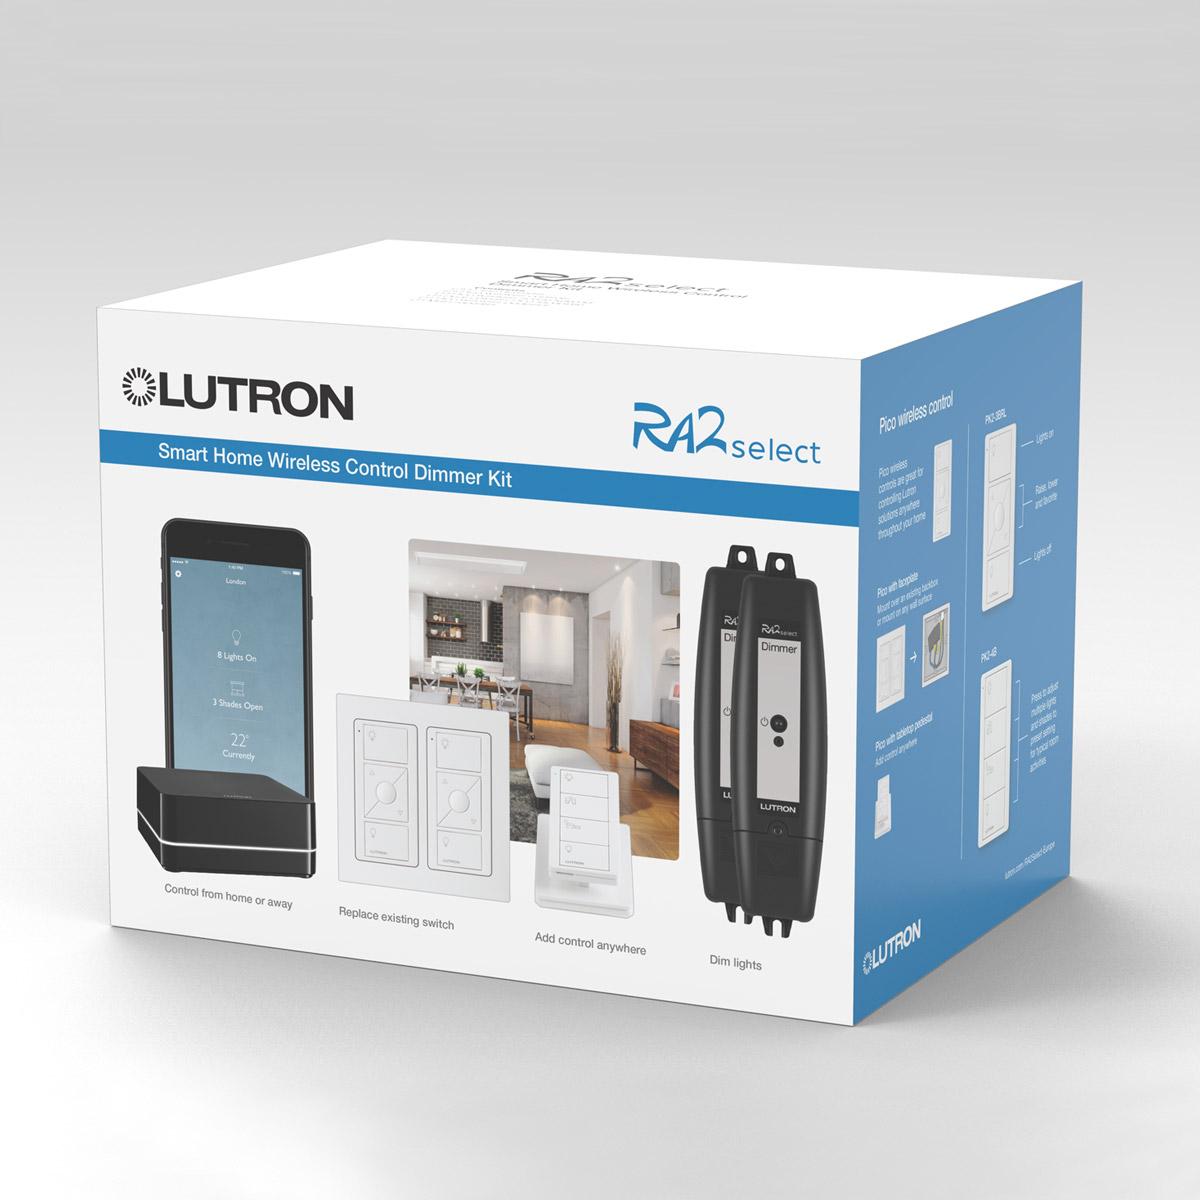 Lutron-RA2-Select-Smart-Home-Kit-RRK-KITREP-2D-Main